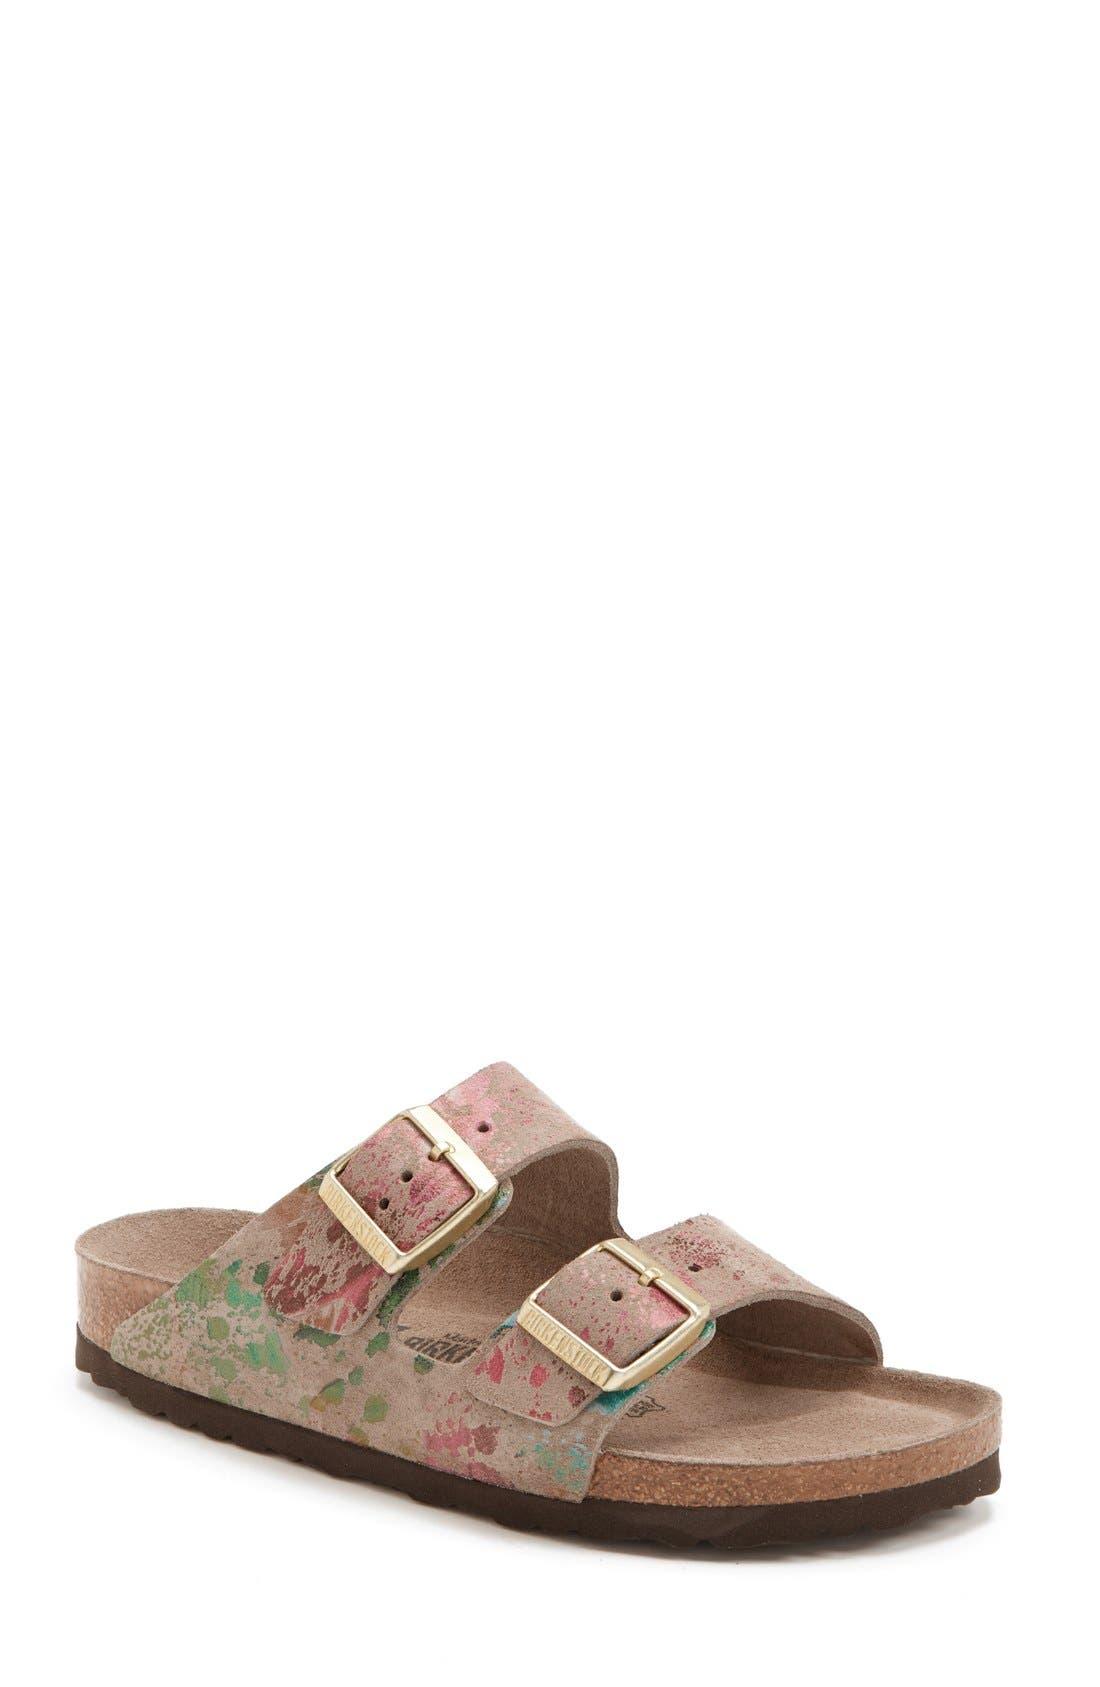 Main Image - Birkenstock 'Arizona' Soft Footbed Printed Leather Sandal (Women)